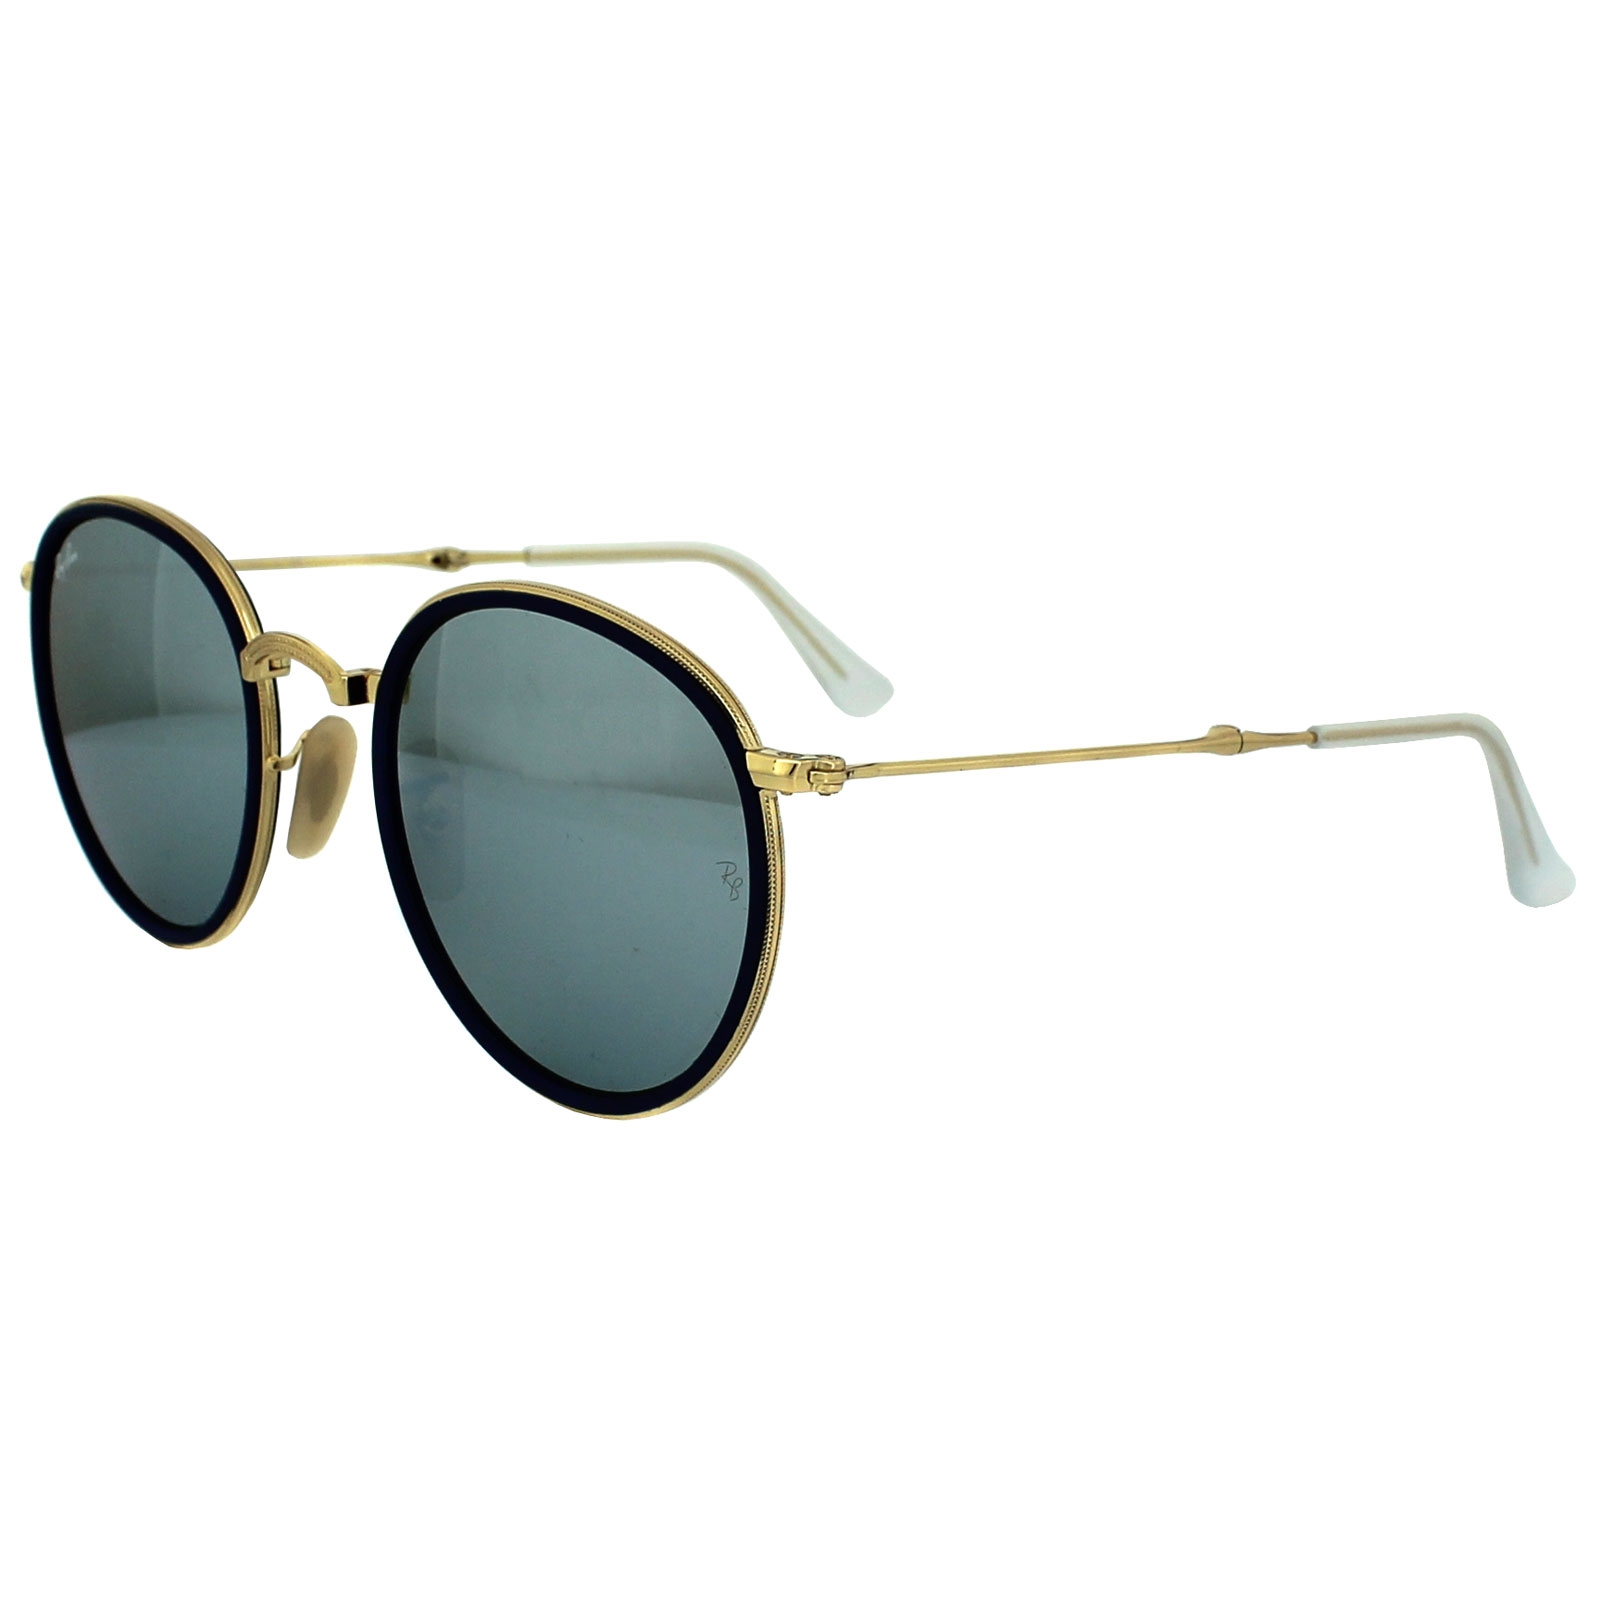 Round Ban Ray 3517 Sunglasses Folding 1c3lJTFK